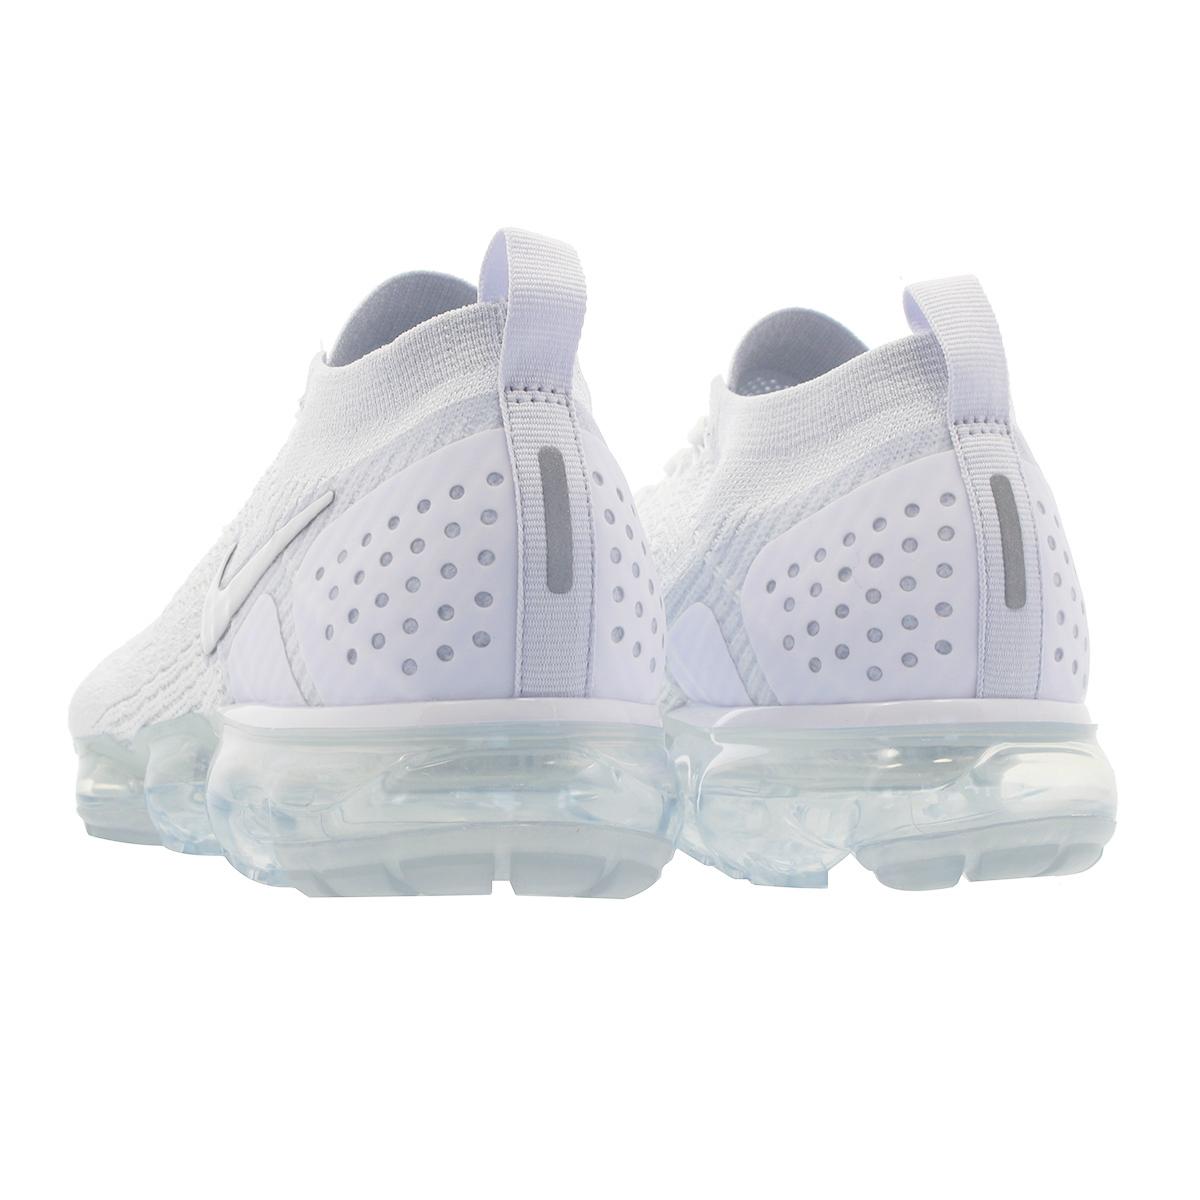 quality design c1b00 b7b4f NIKE AIR VAPORMAX FLYKNIT 2 Nike vapor max fried food knit 2 WHITE/VAST  GREY/FOOTBALL GREY 942,842-105